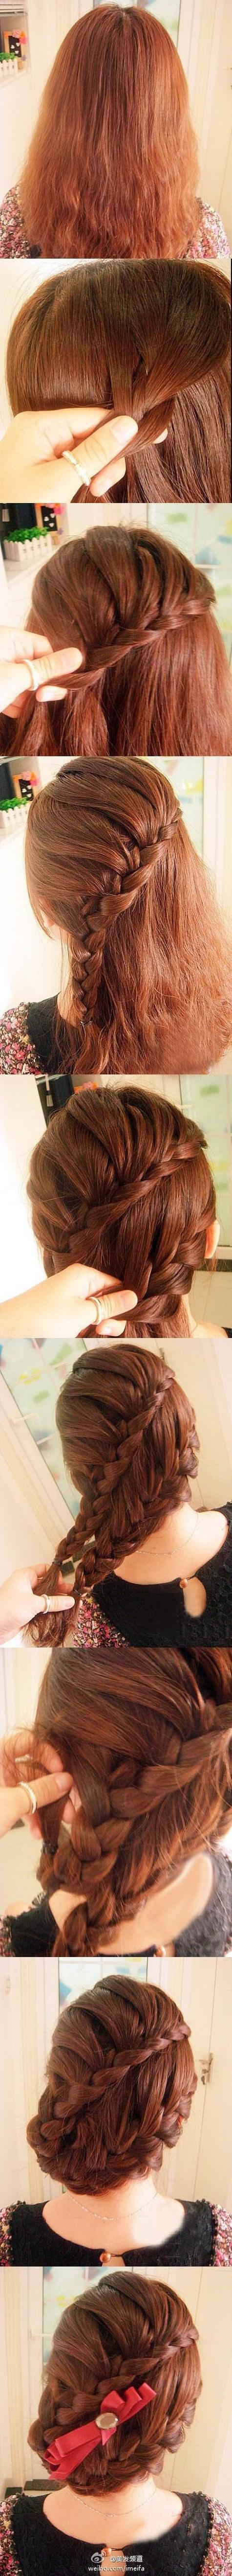 Hairstyle Tutorials (bests of pinterest gallery)